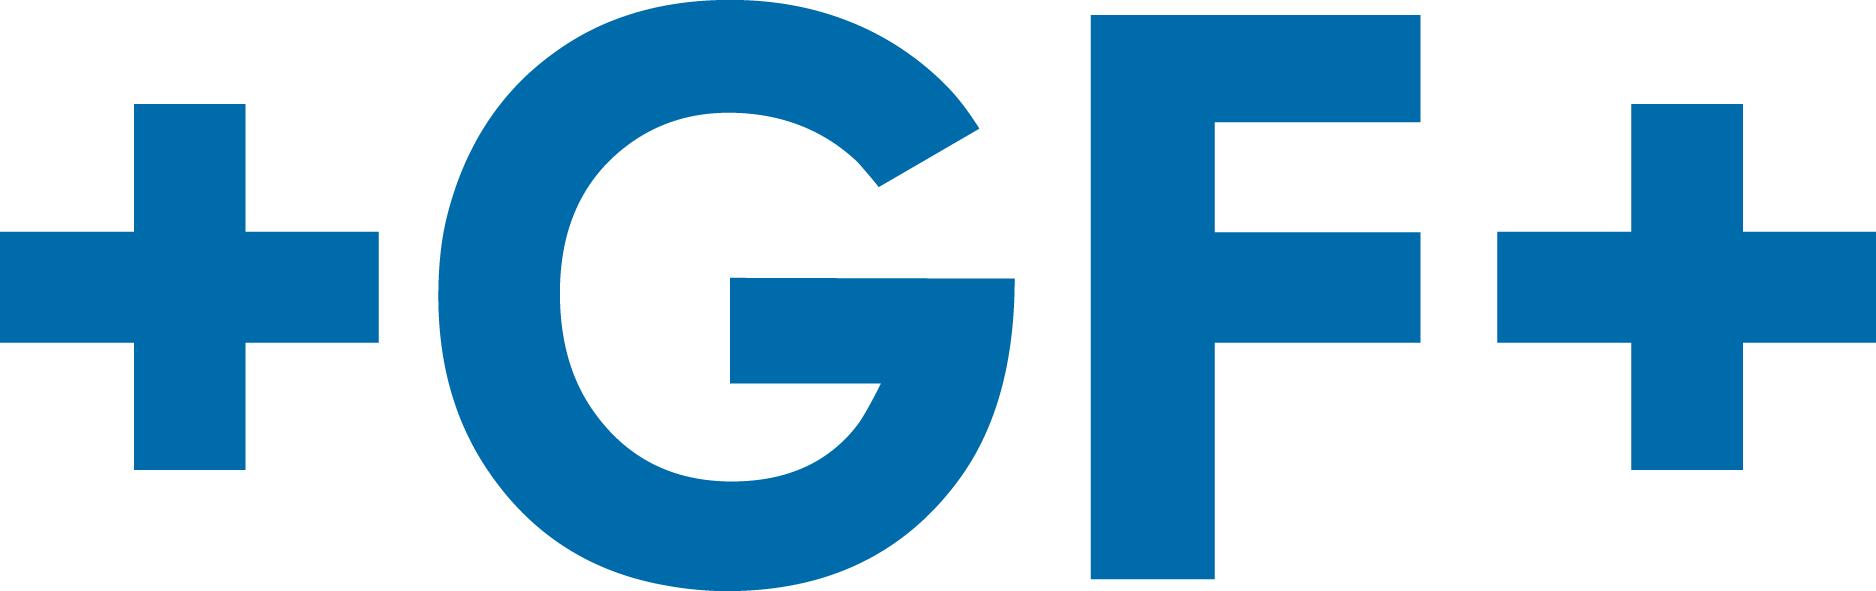 GF Machining Solutions LLC - Charlotte